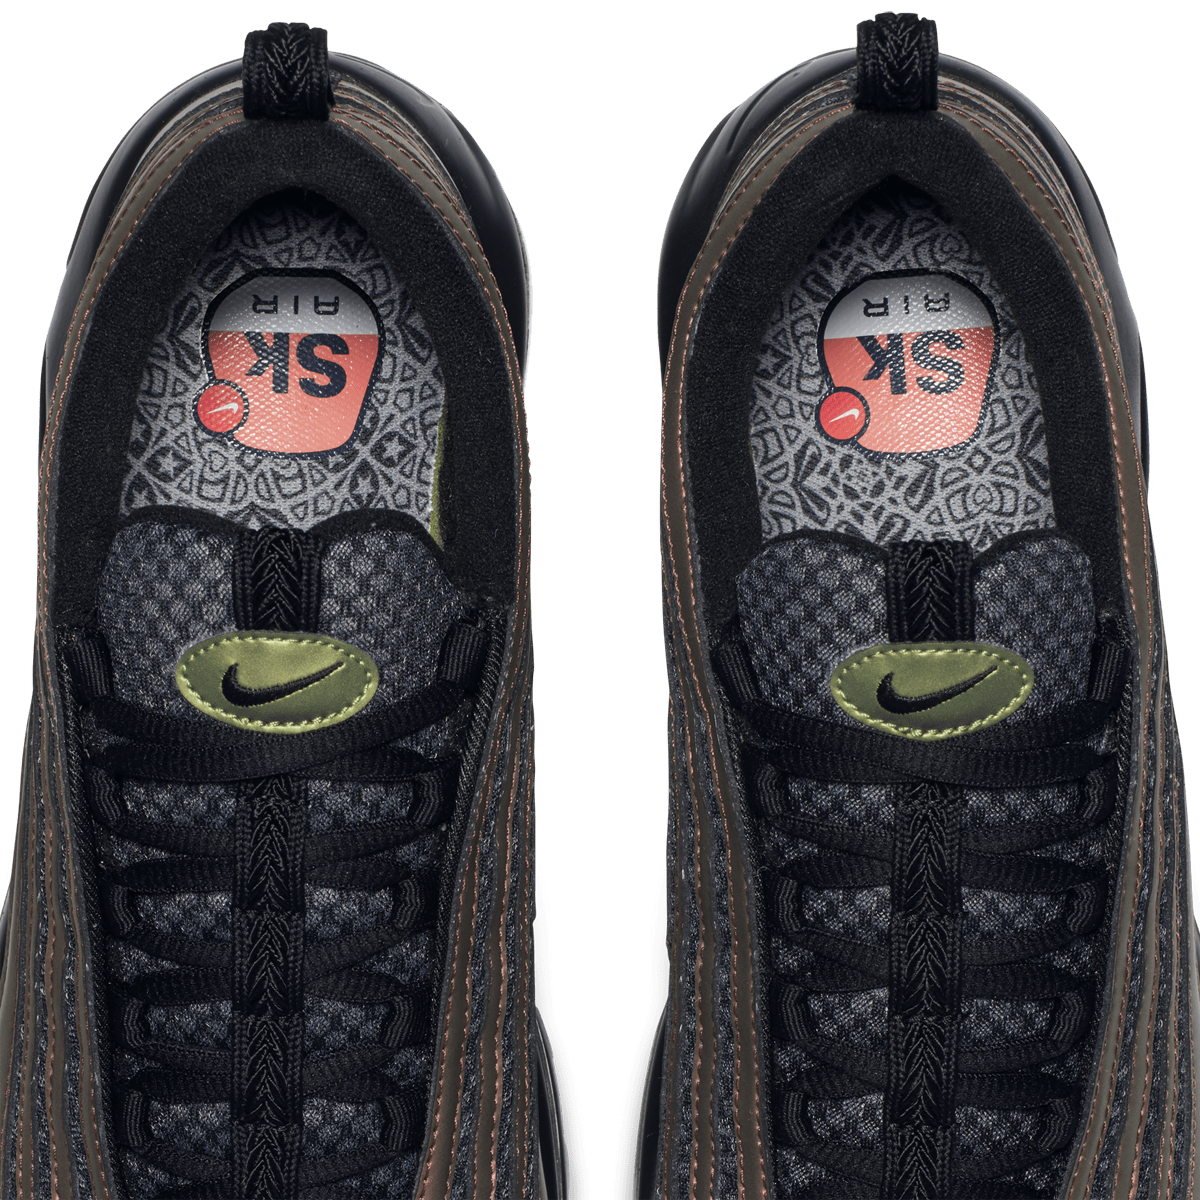 Skepta Nike Air Max 97 AJ1988-900 Insole